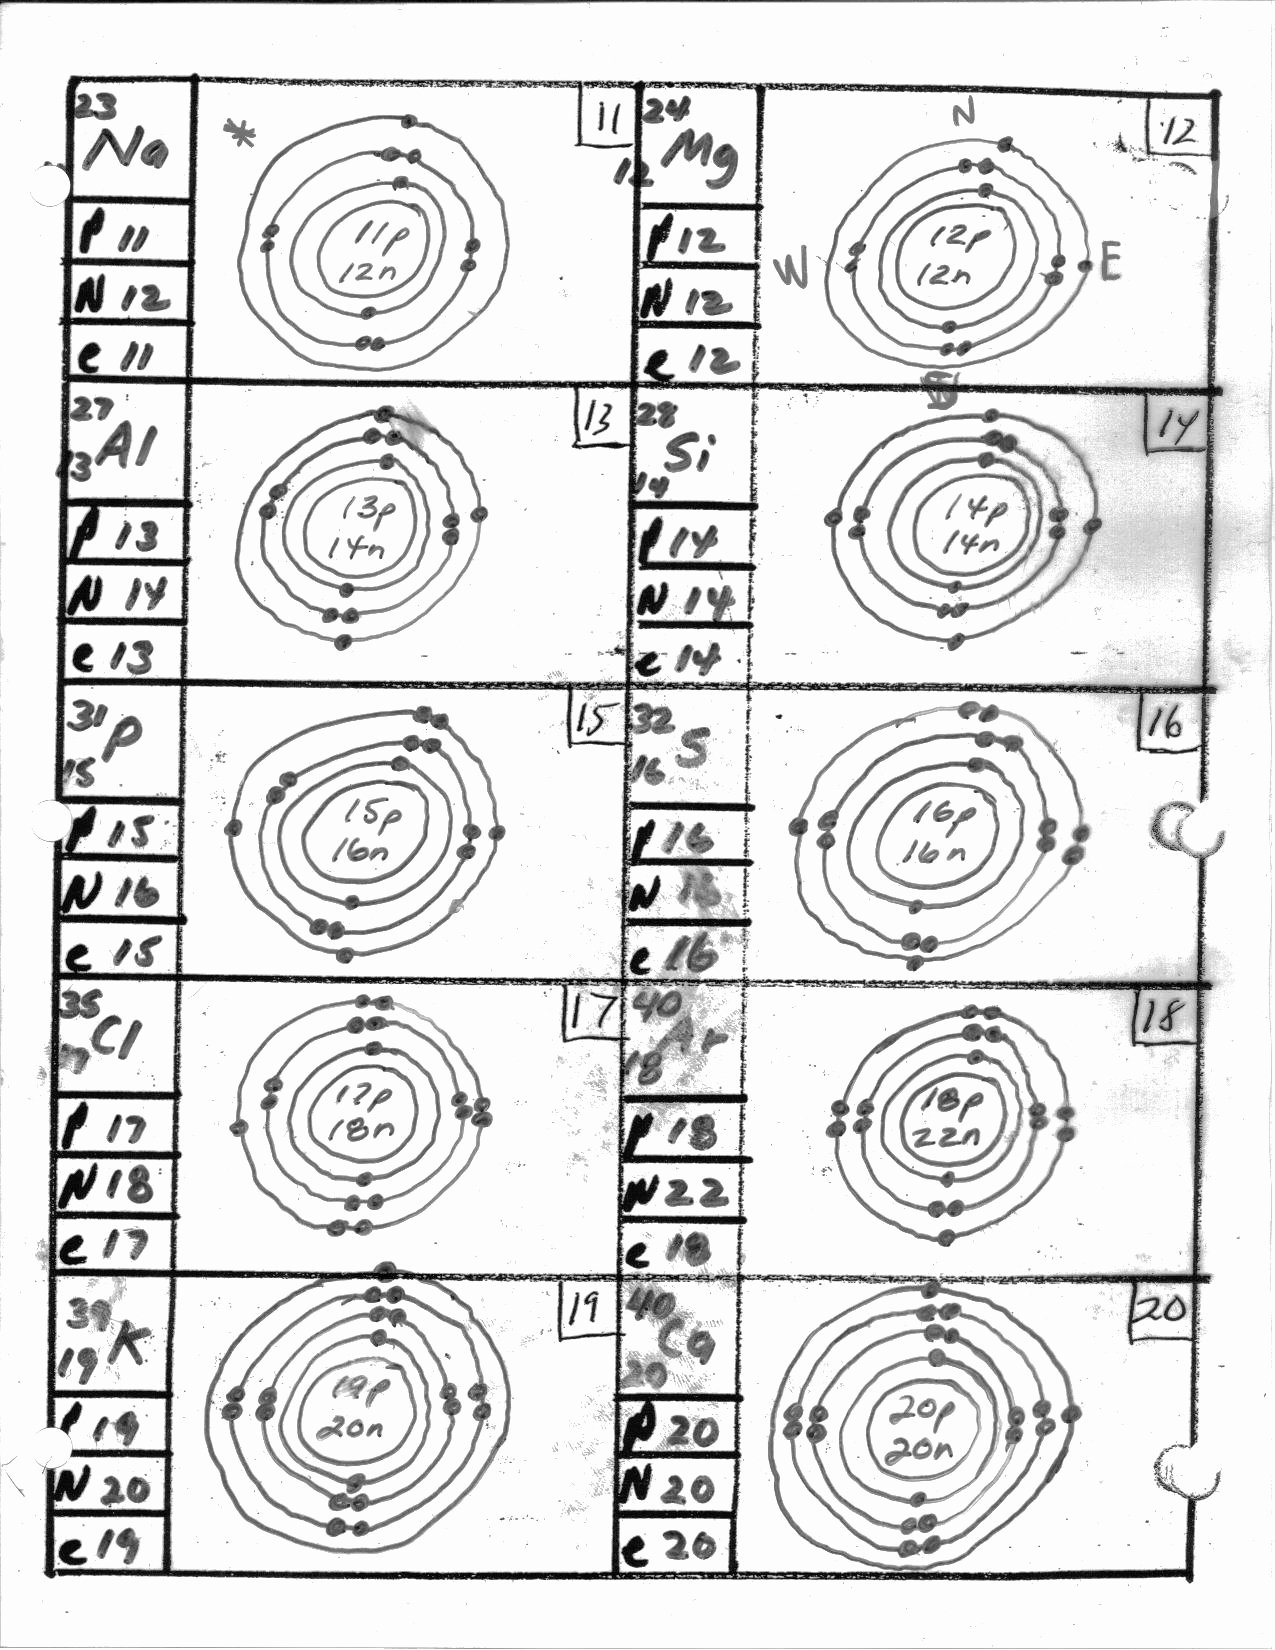 50 Bohr Atomic Models Worksheet Answers